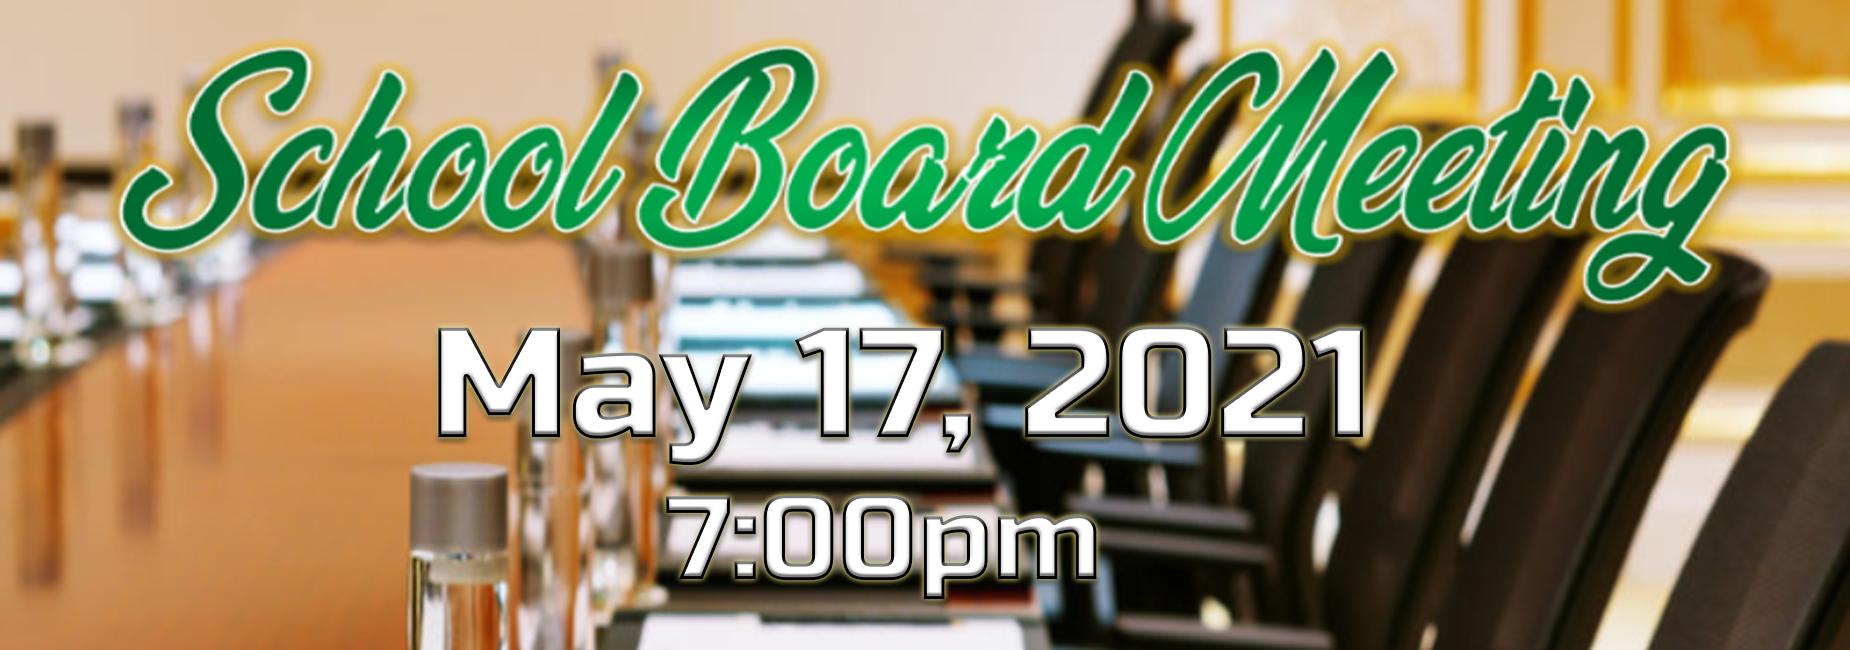 School Board Meeting May 17th 7pm